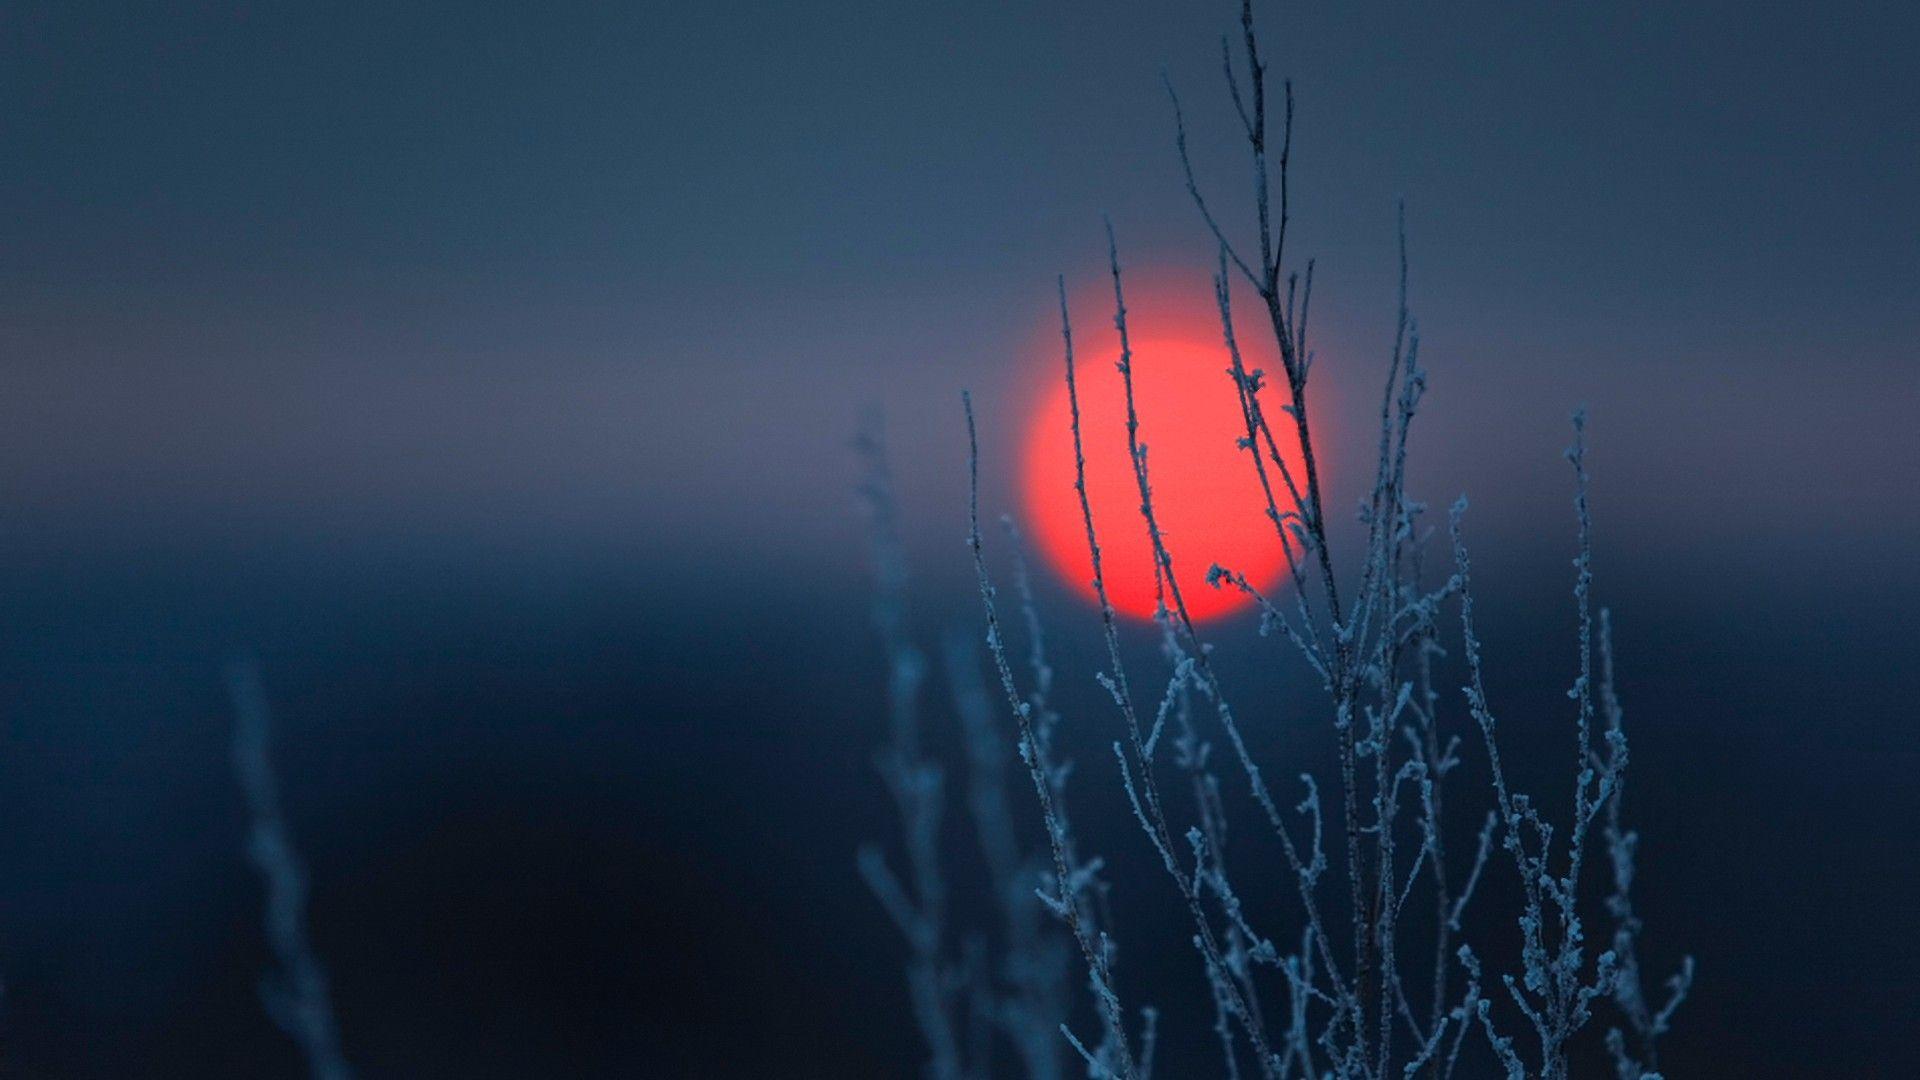 Red Spot On A Dark Background Desktop Wallpapers 1920x1080 Dark Background Wallpaper Sunset Wallpaper Landscape Wallpaper